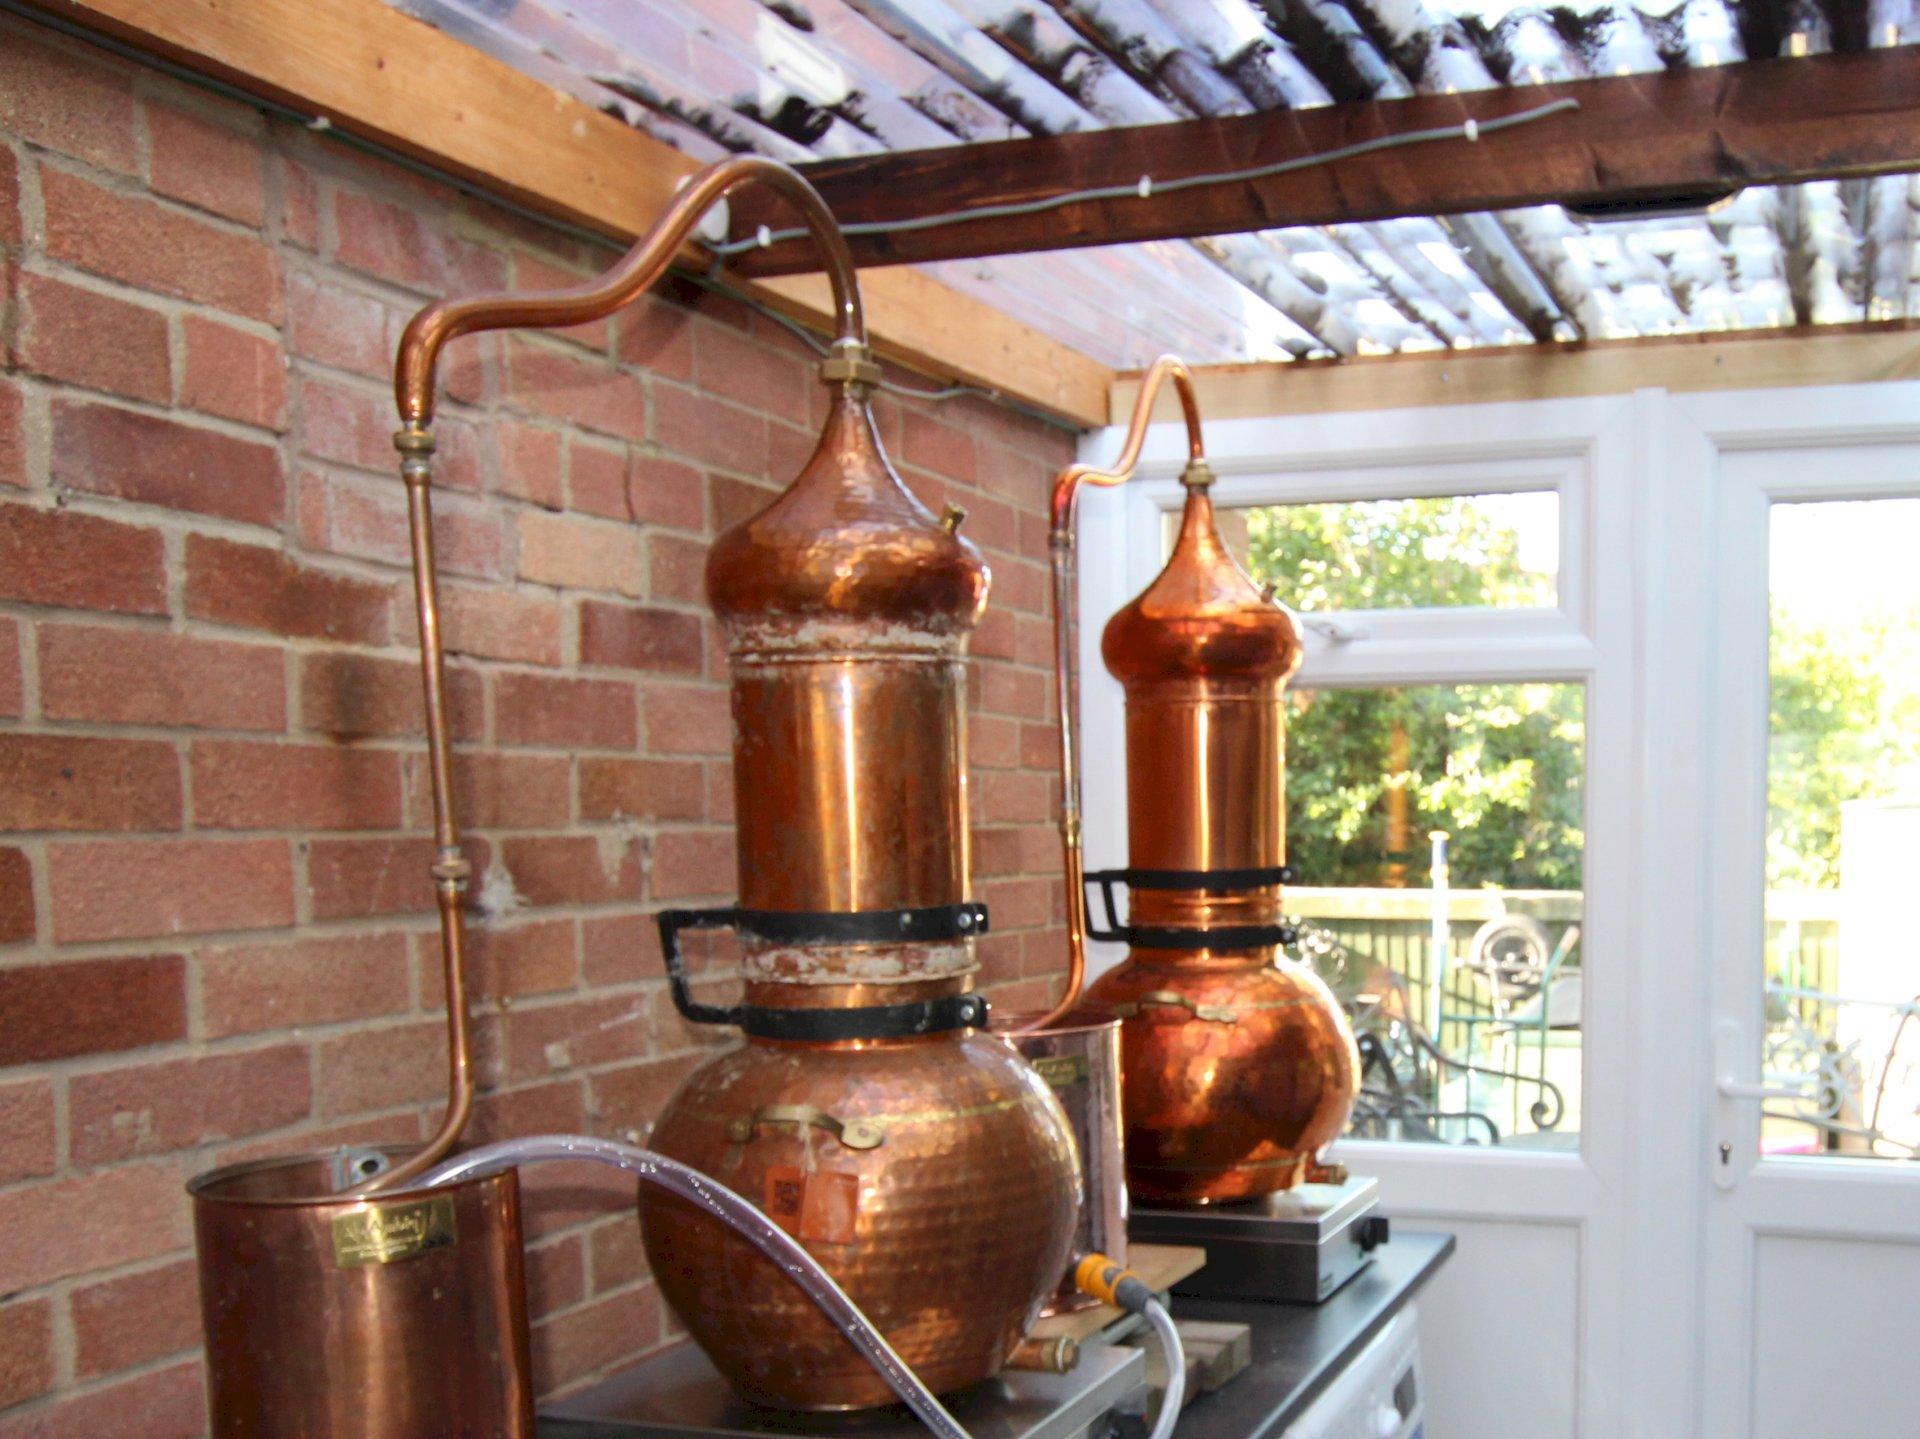 Mother's Ruin Chalgrove Artisan Distillery 2 stills